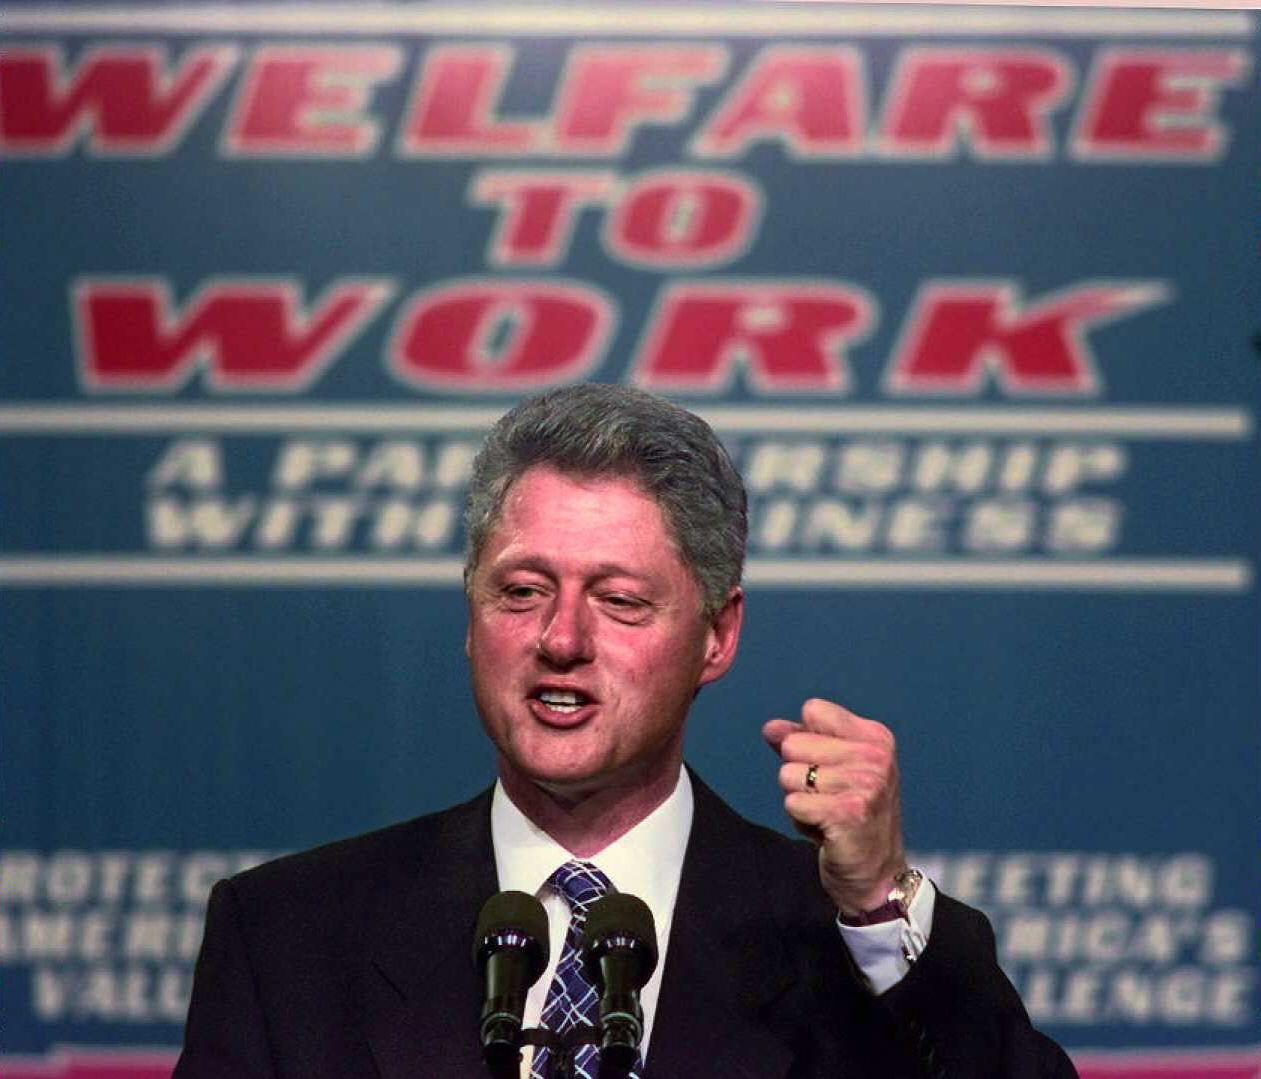 Bill Clinton Welfare Reform